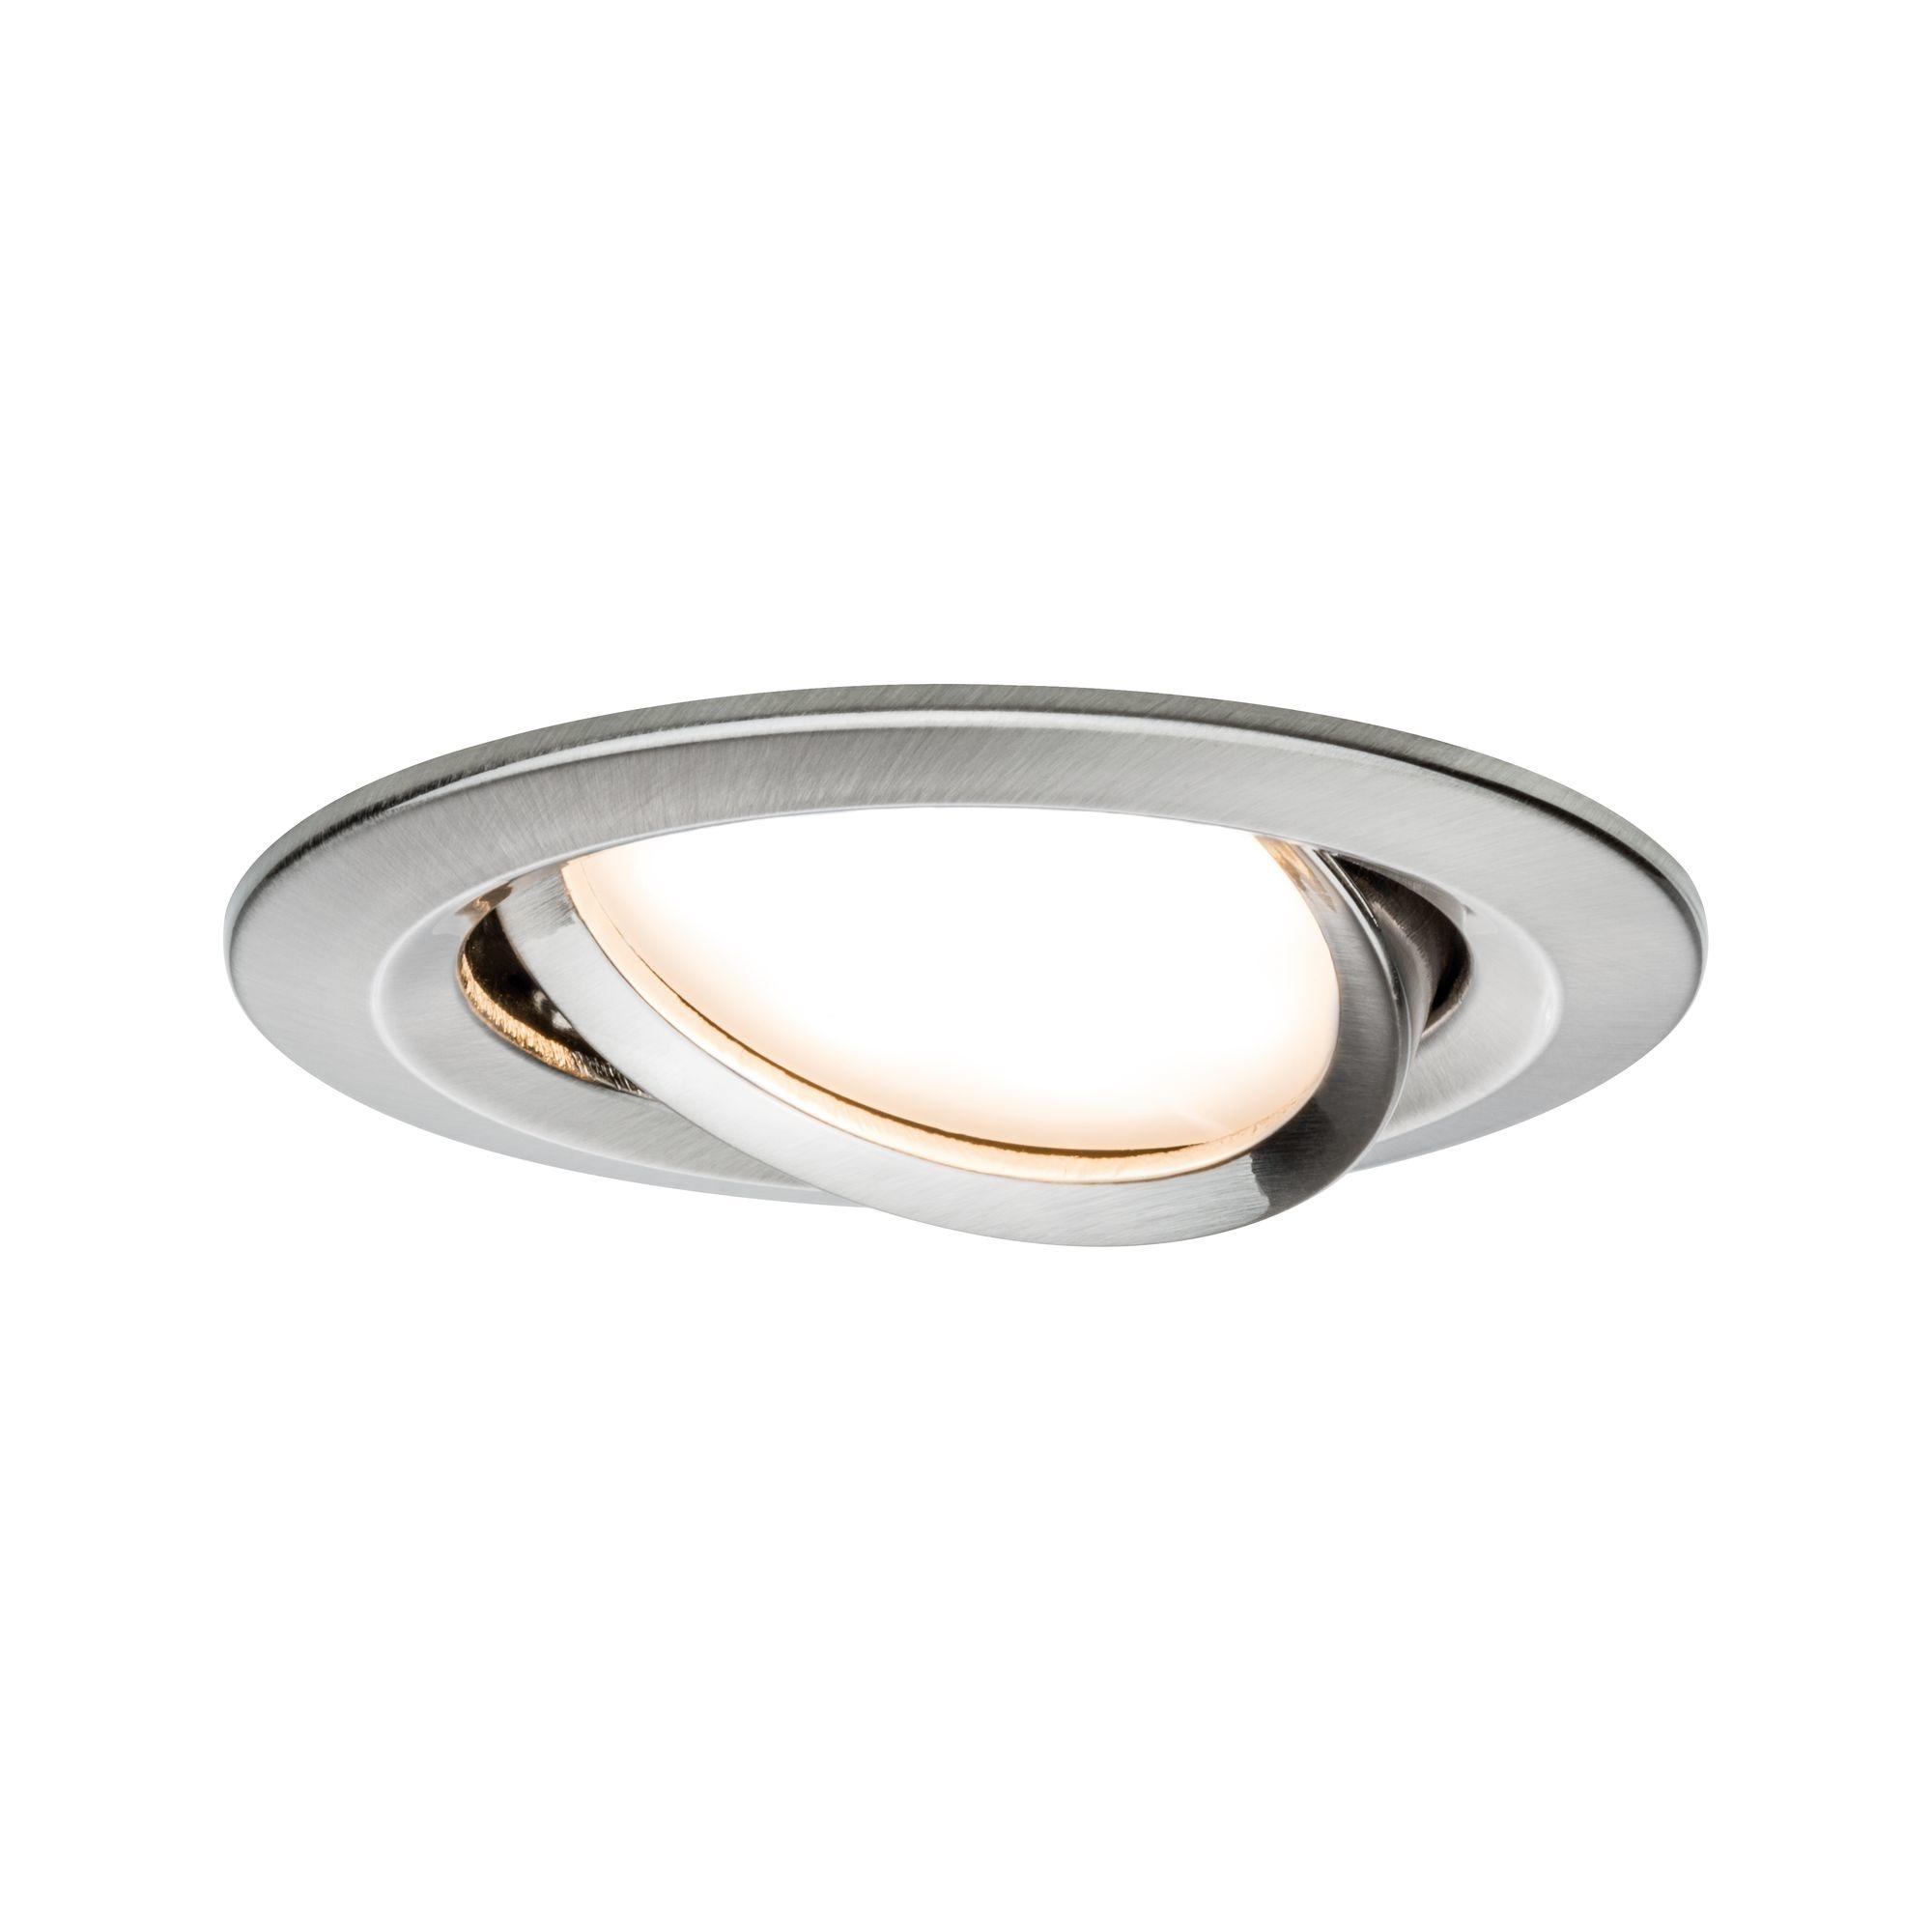 Paulmann EBL Set Nova Coin rund schwenkbar LED1x6,5W 2700K 230V Eisen geb/Alu